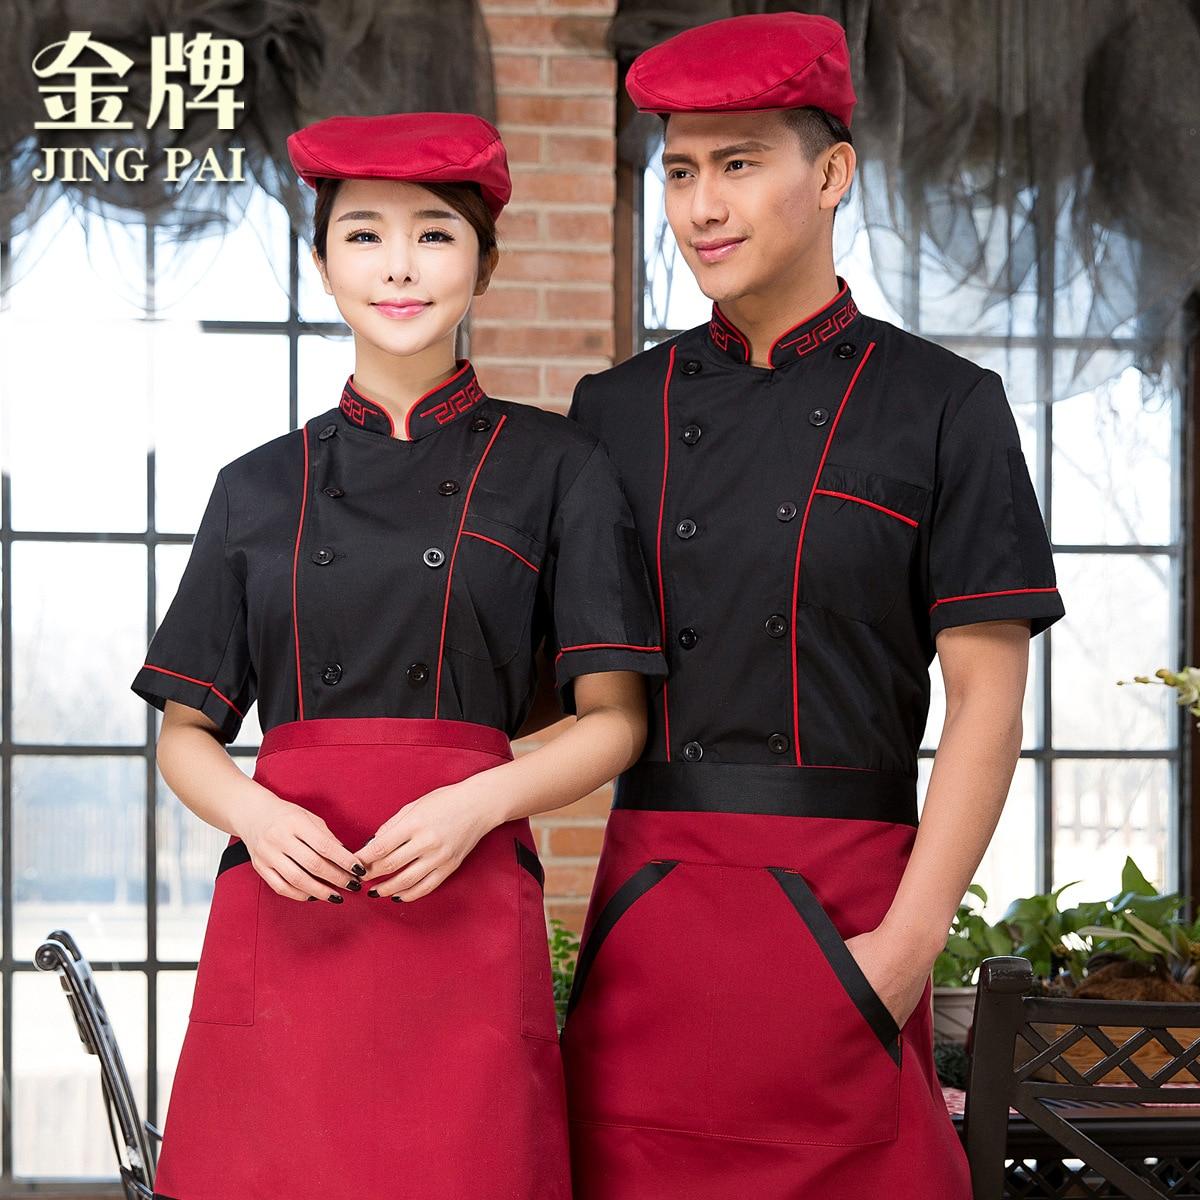 Unisex Chef's Uniform Adult Breathable Fabrics Chef  Jackets Short Sleeve Female Work Wear Baker's Clothes Plus Size B-5952